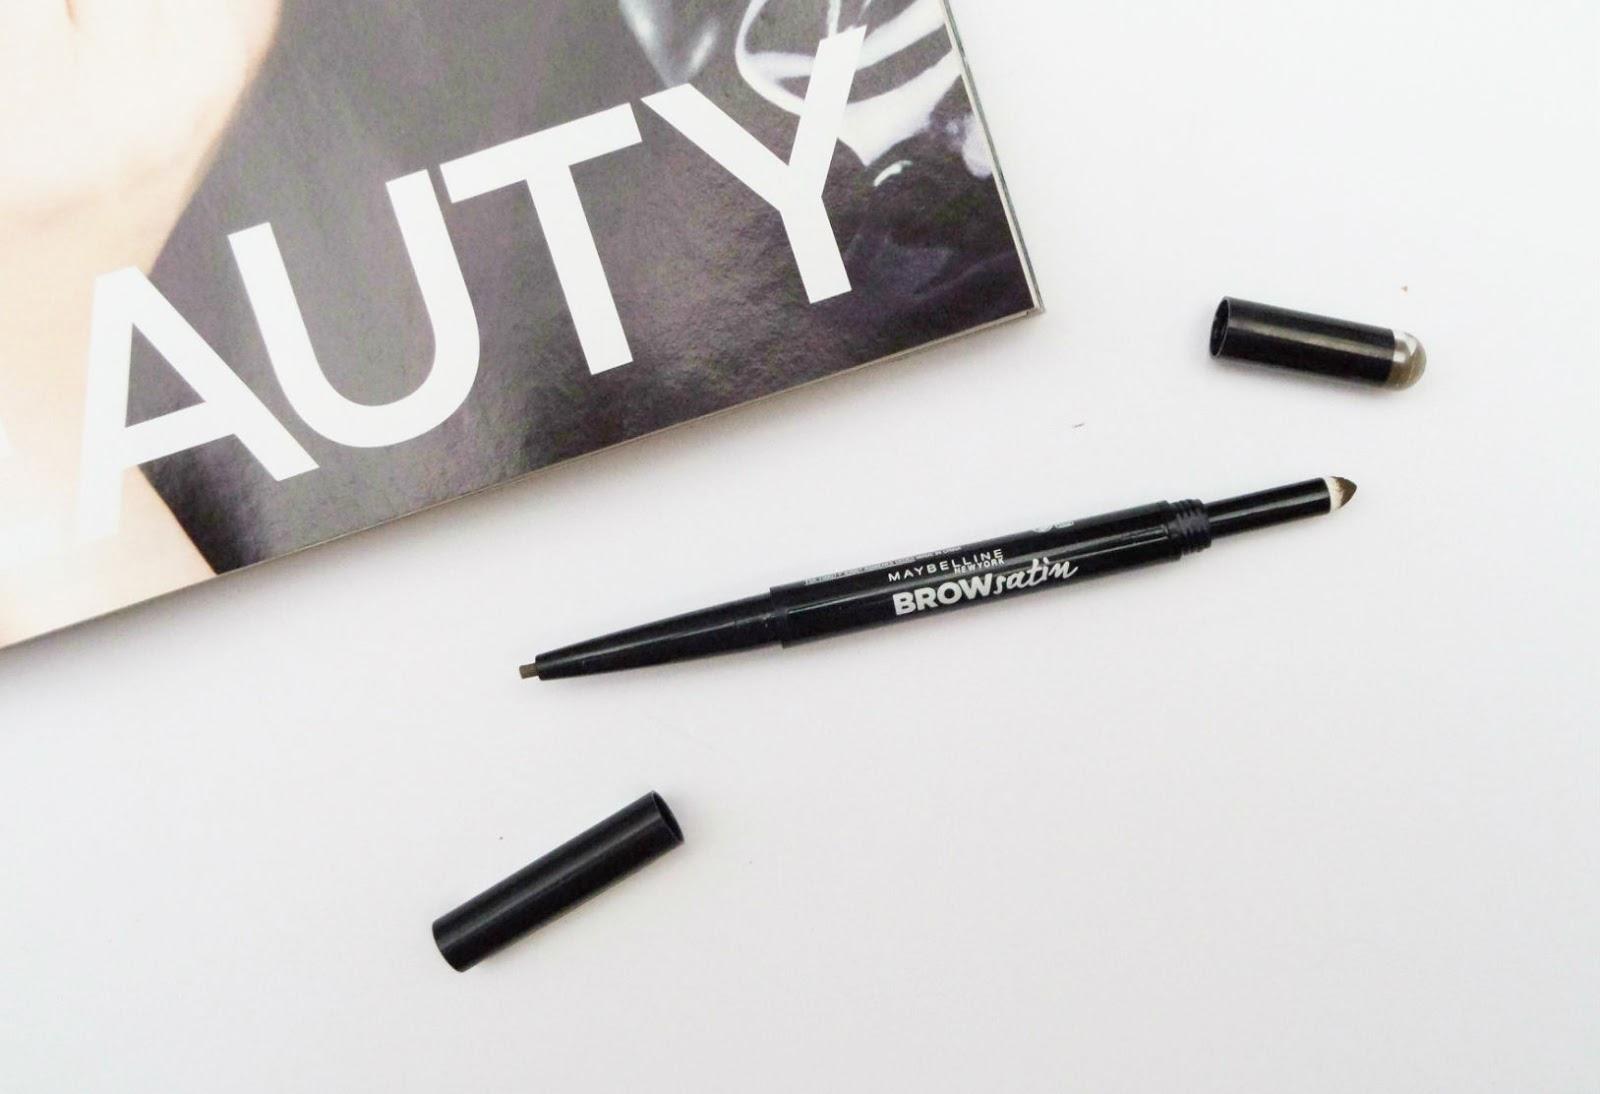 The Maybelline Brow Satin Eyebrow Pencil